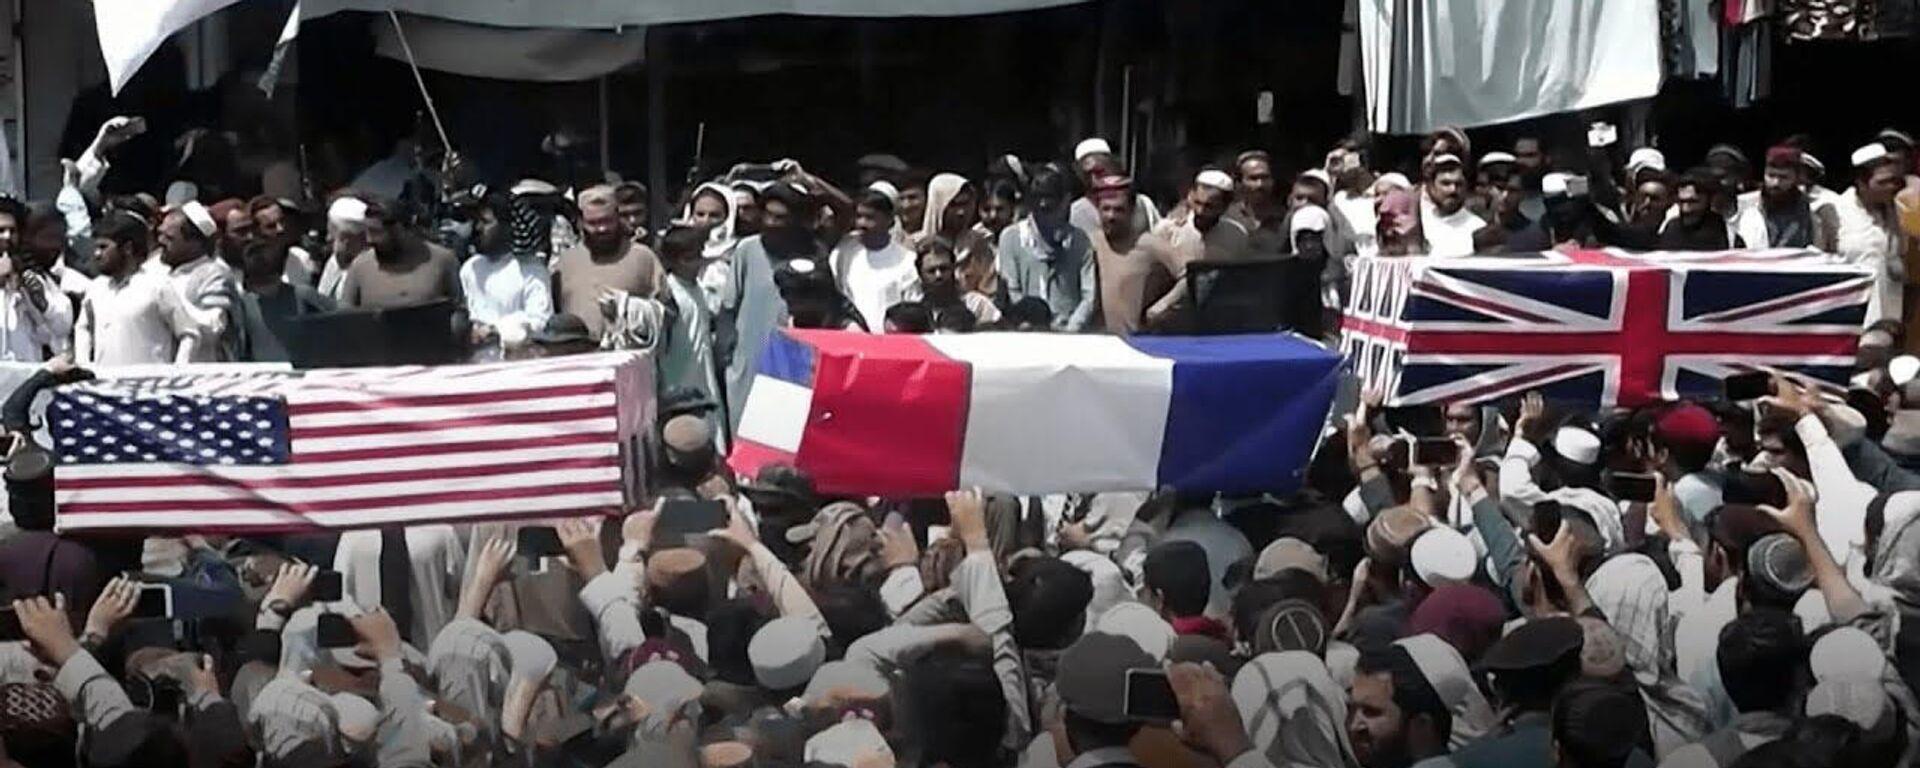 Имитация похорон Великобритании, НАТО и США в Афганистане - Sputnik Таджикистан, 1920, 01.09.2021